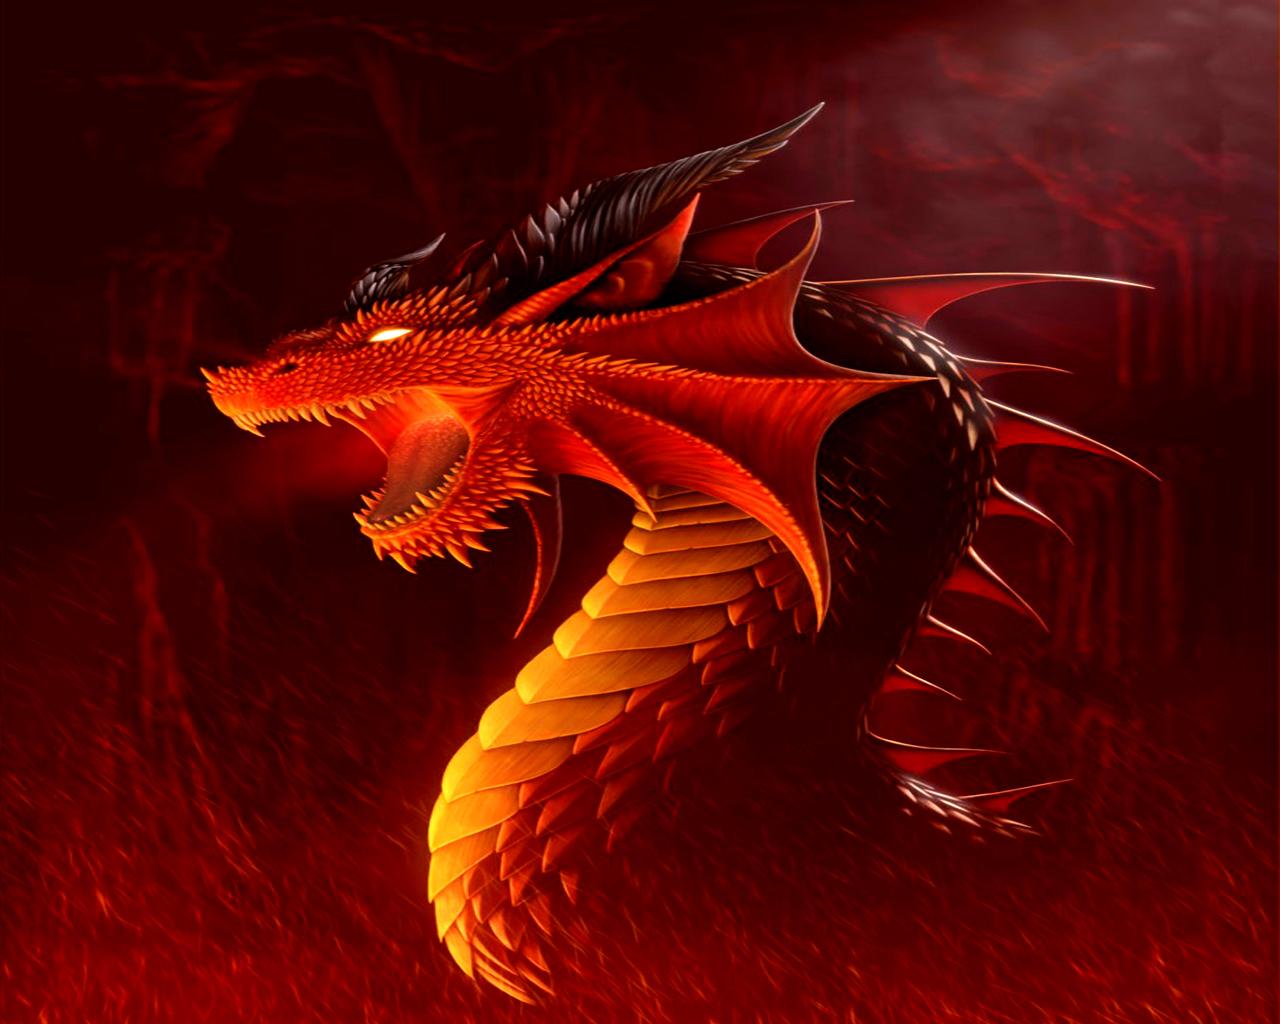 red dragon fire dragon purple dragon blue dragon blue dragon fantasy 1280x1024